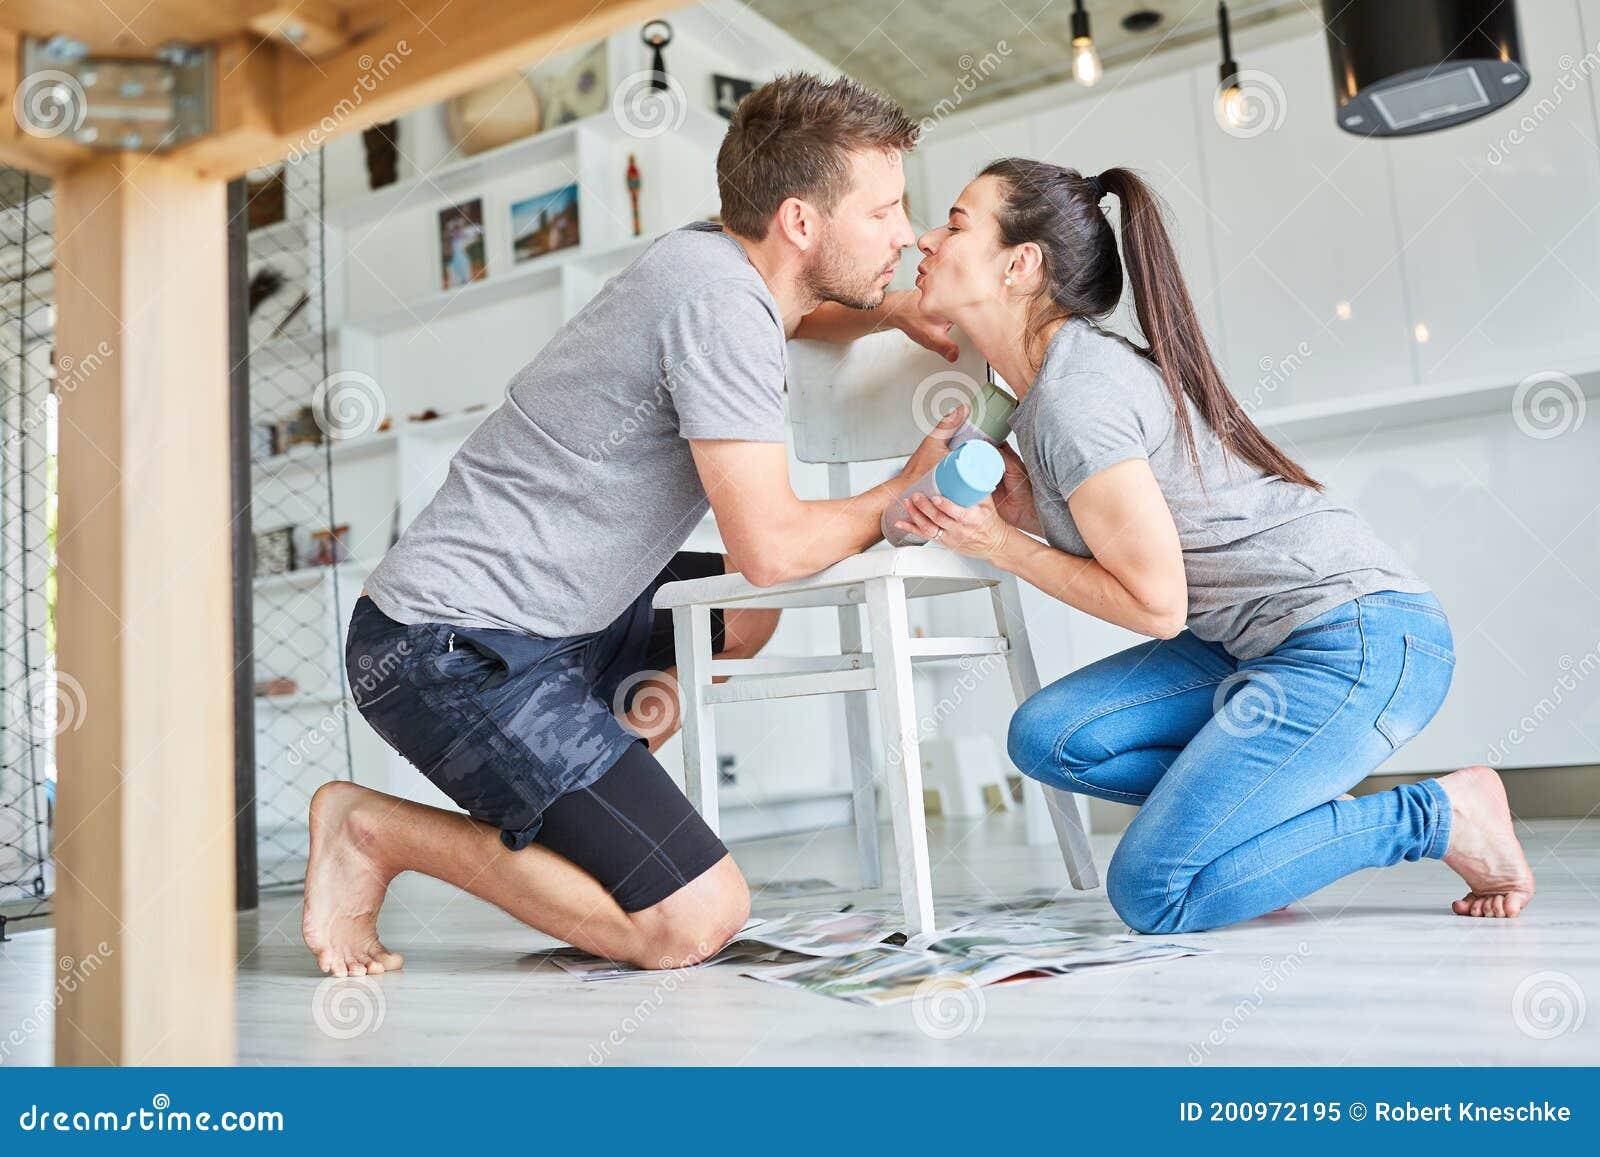 handyman dating